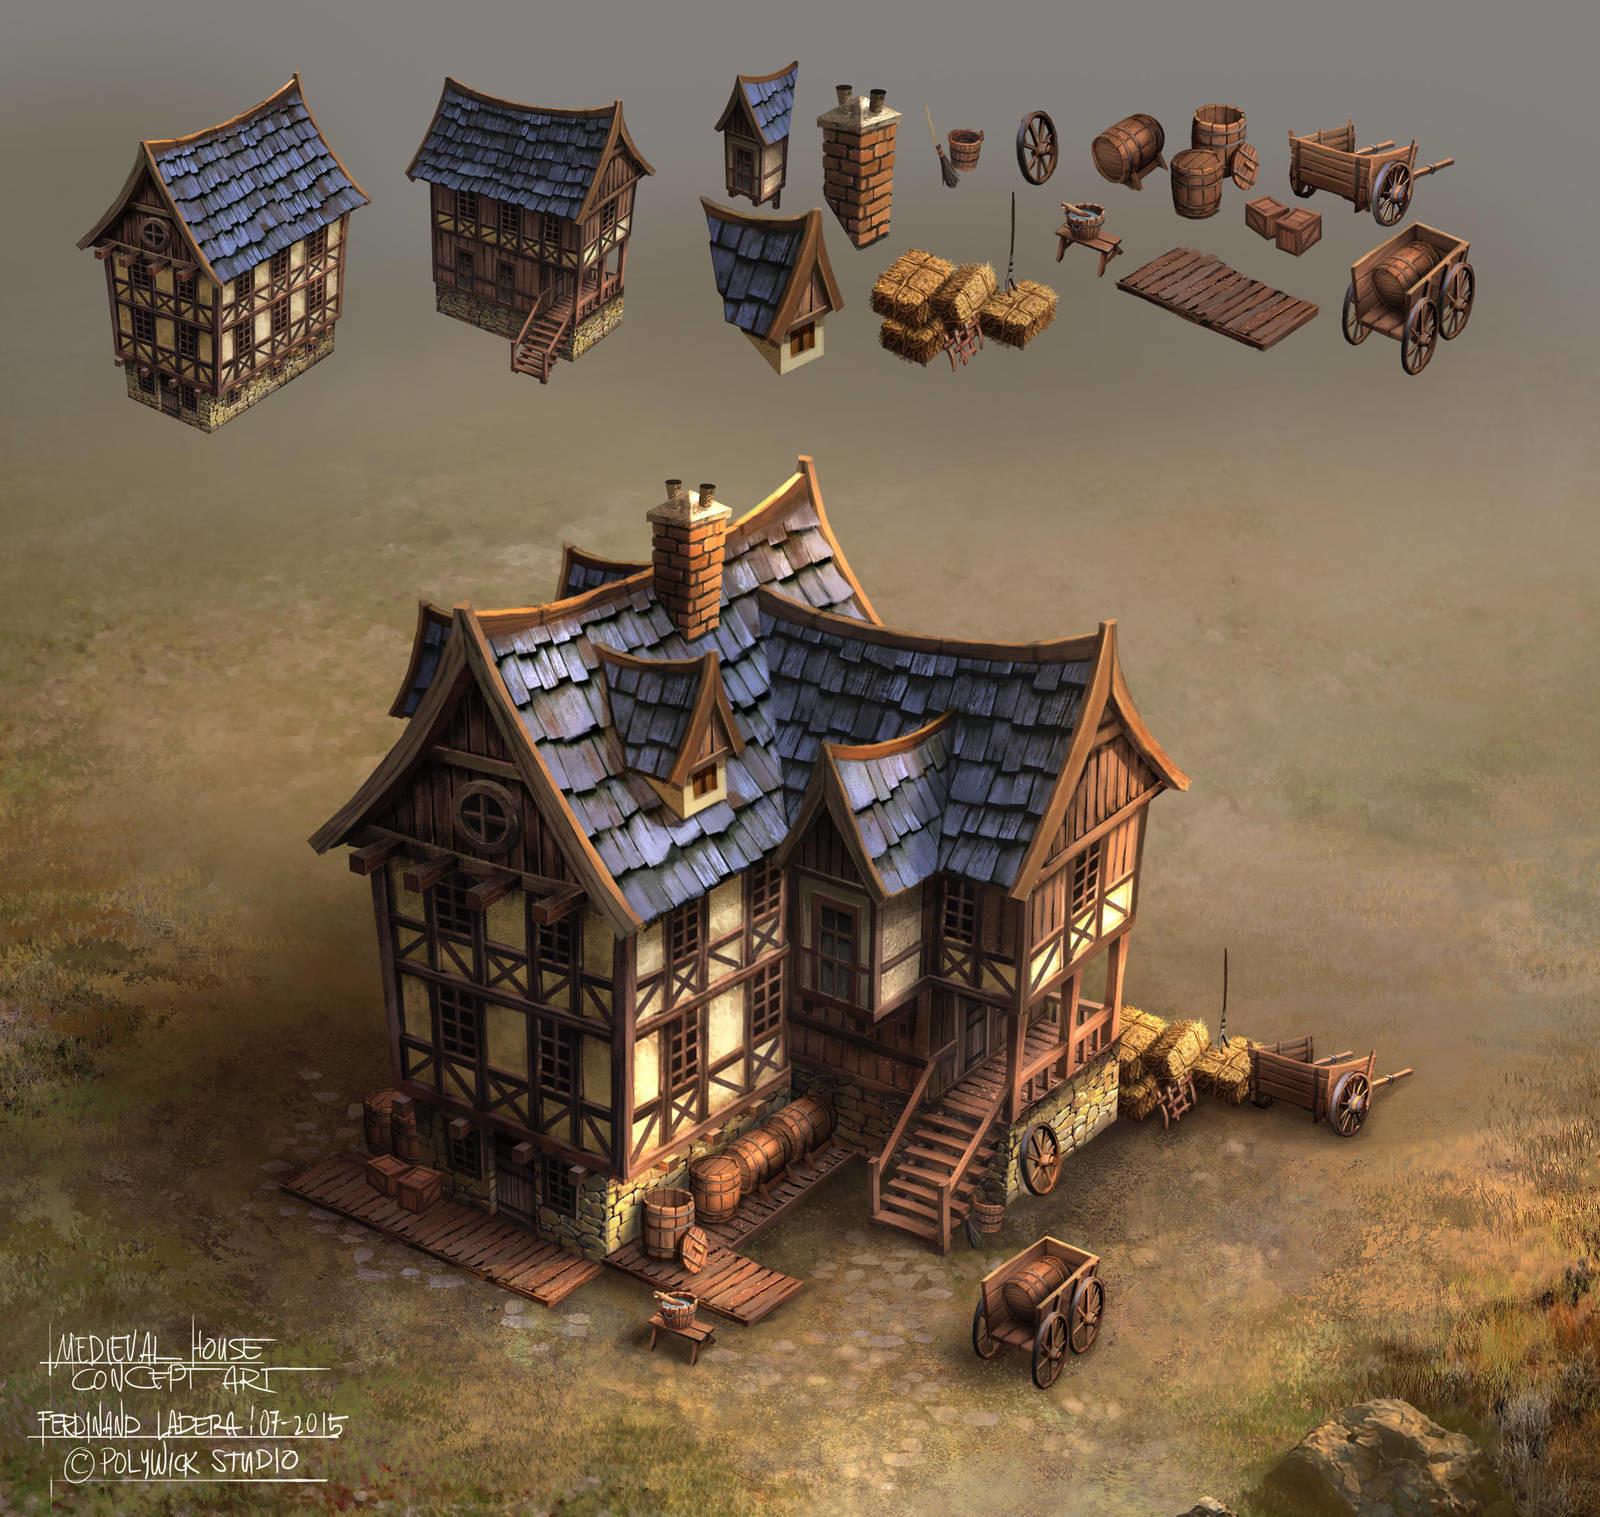 Ferdinand ladera medieval house conceptart